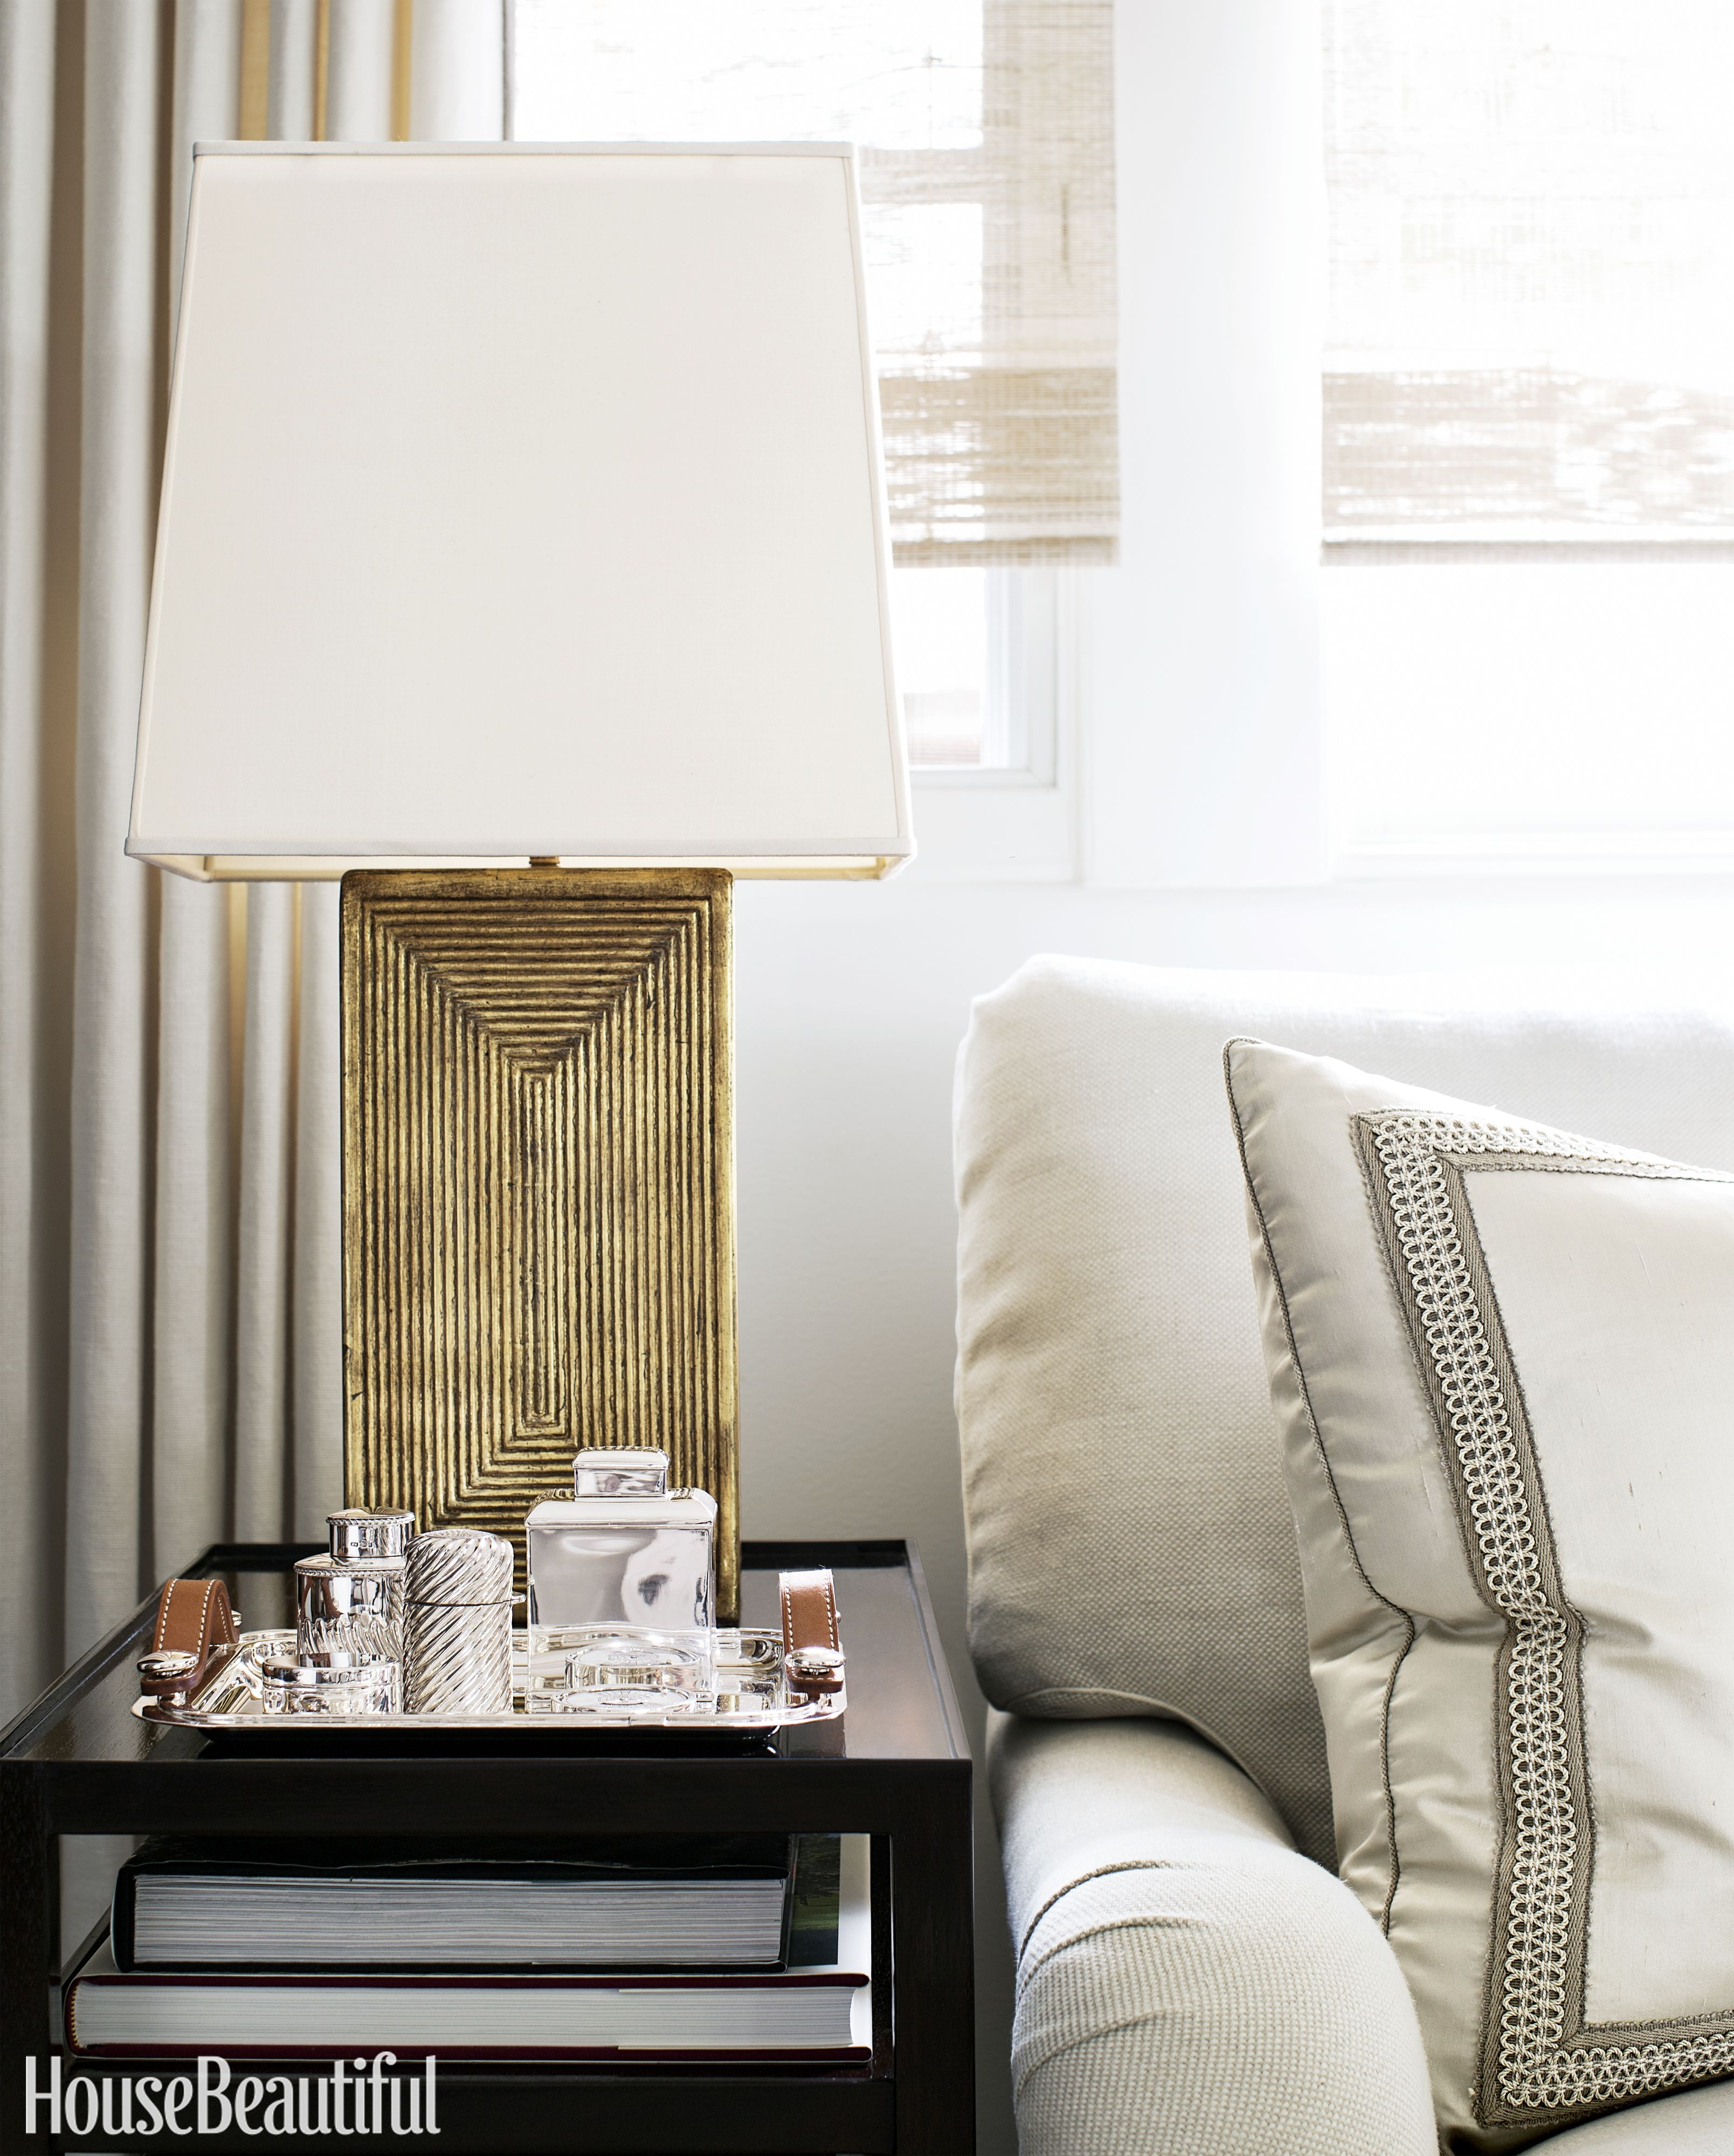 28 Best Interior Decorating Secrets - Decorating Tips and Tricks ...